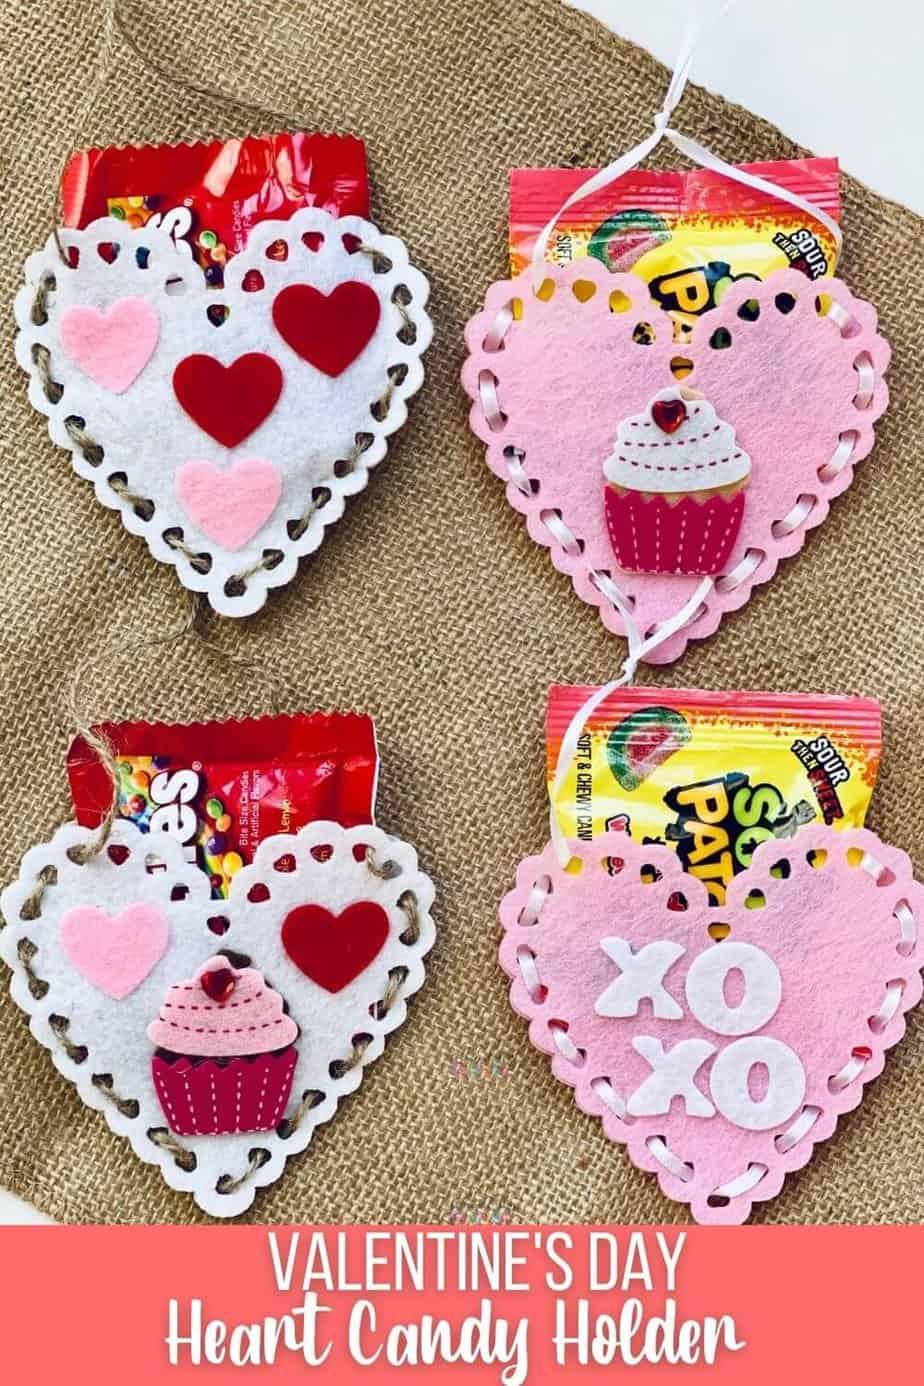 Valentines Day Heart Candy Holder Dollar Store Craft